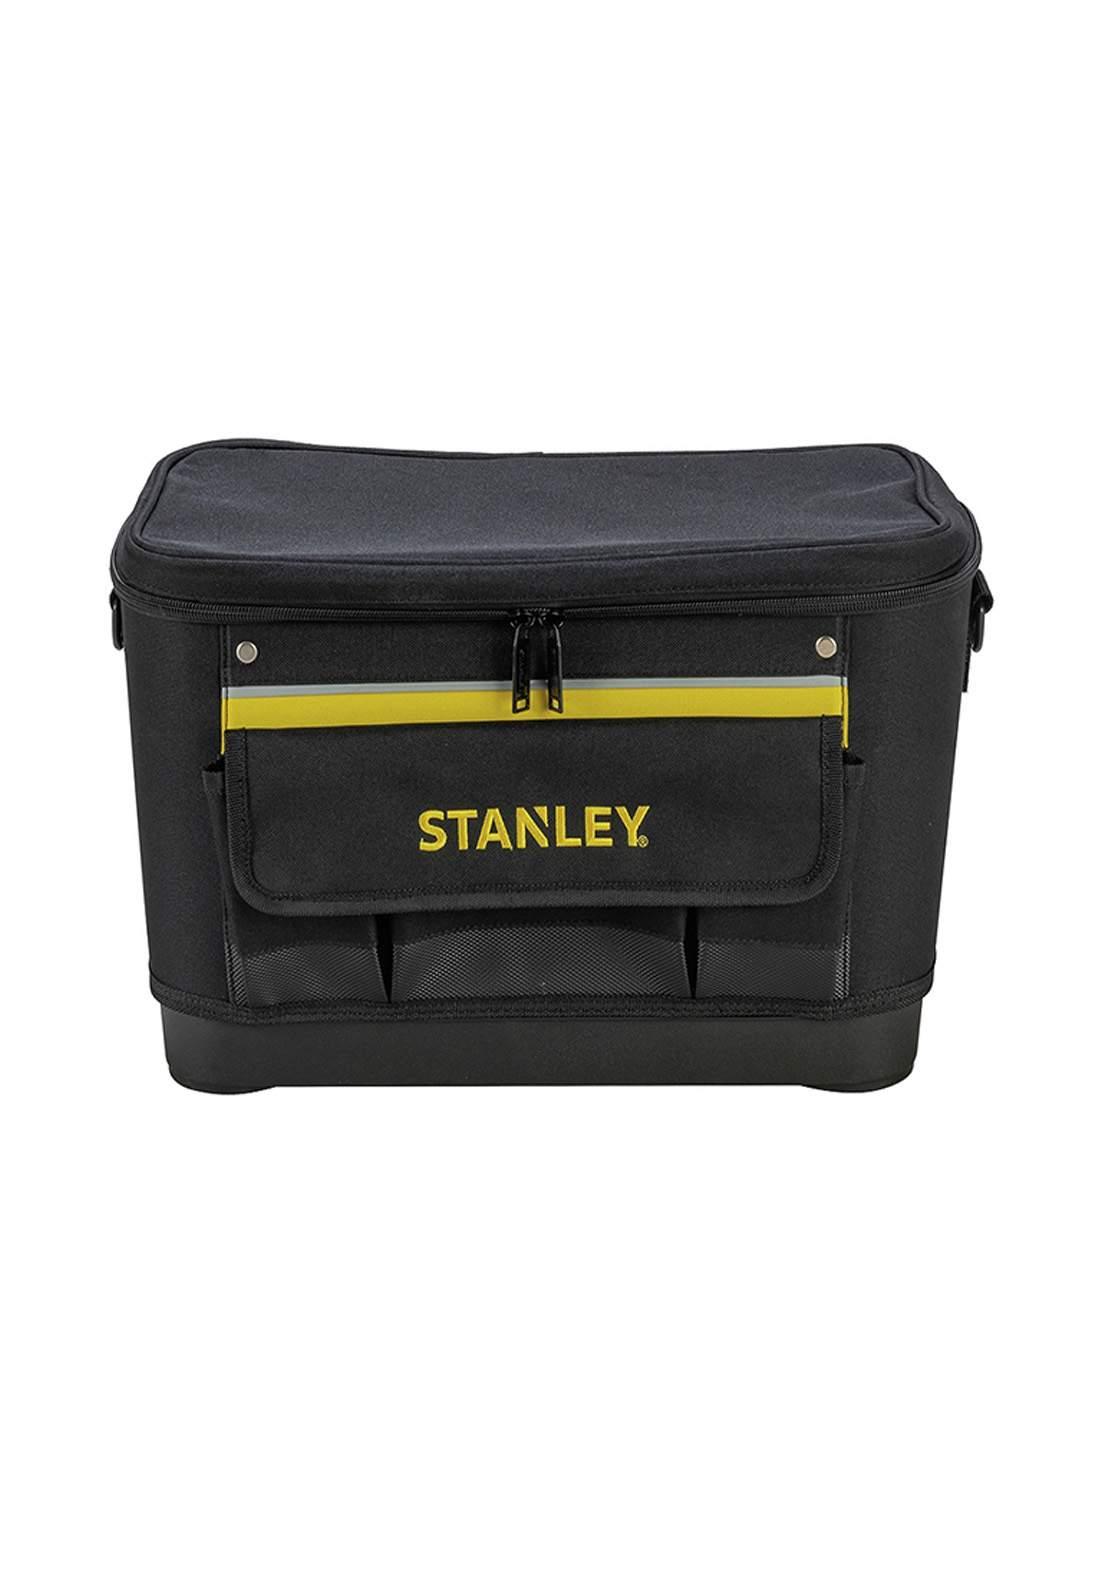 Stanley 1-96-193 Rigid Multipurp Tool Bag 16 inch حقيبة ادوات